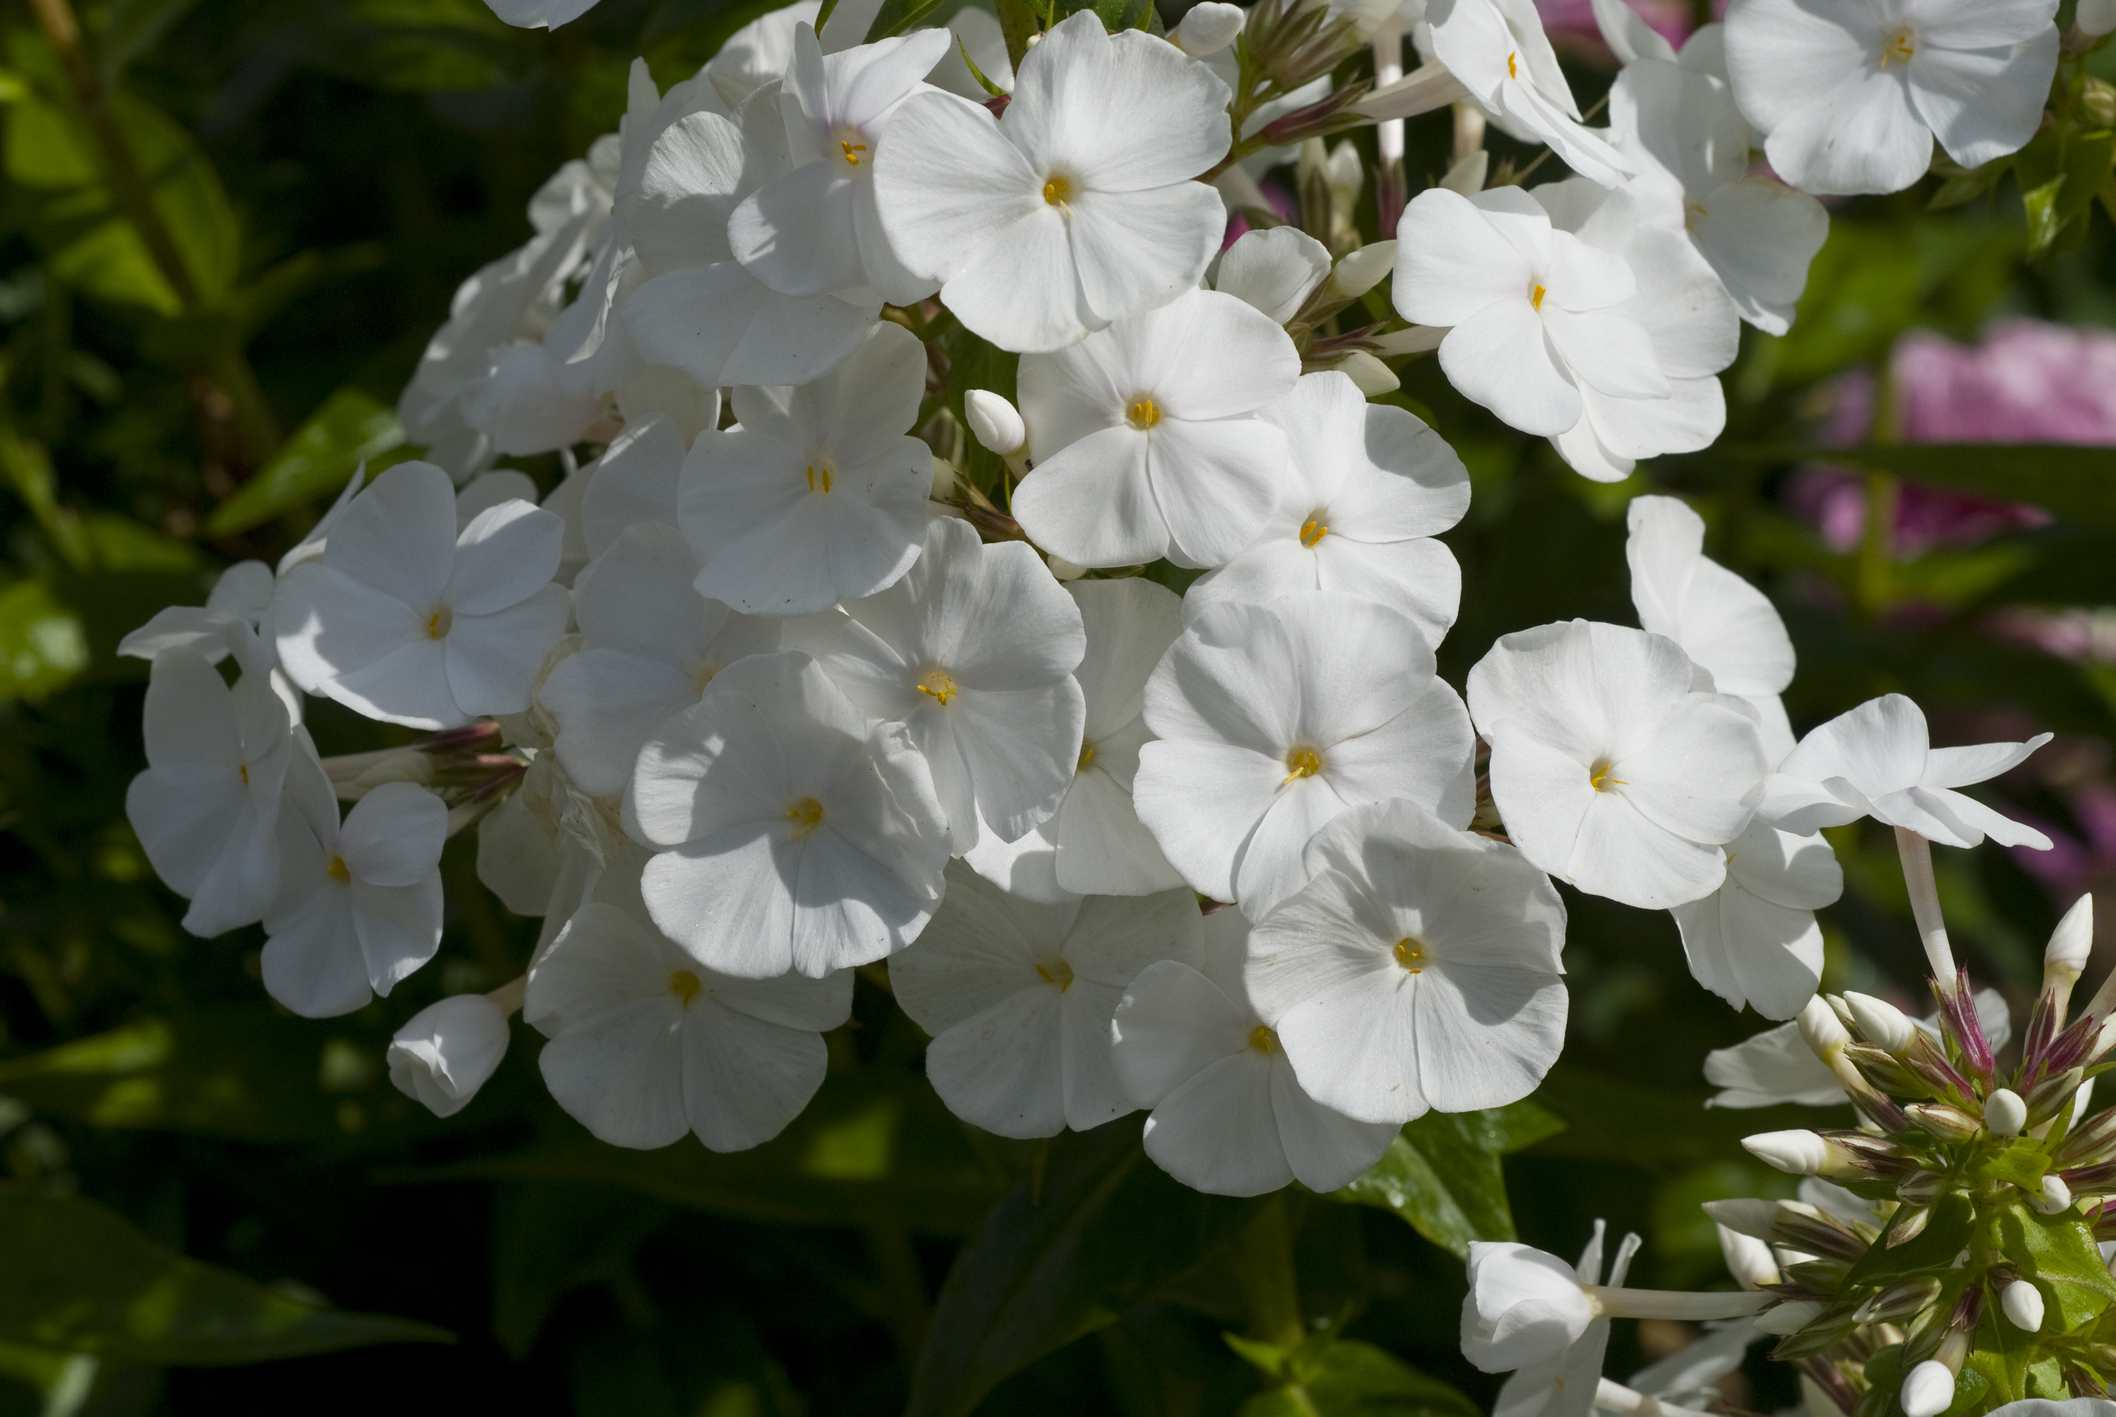 Close-up of white flower head of 'David' phlox.